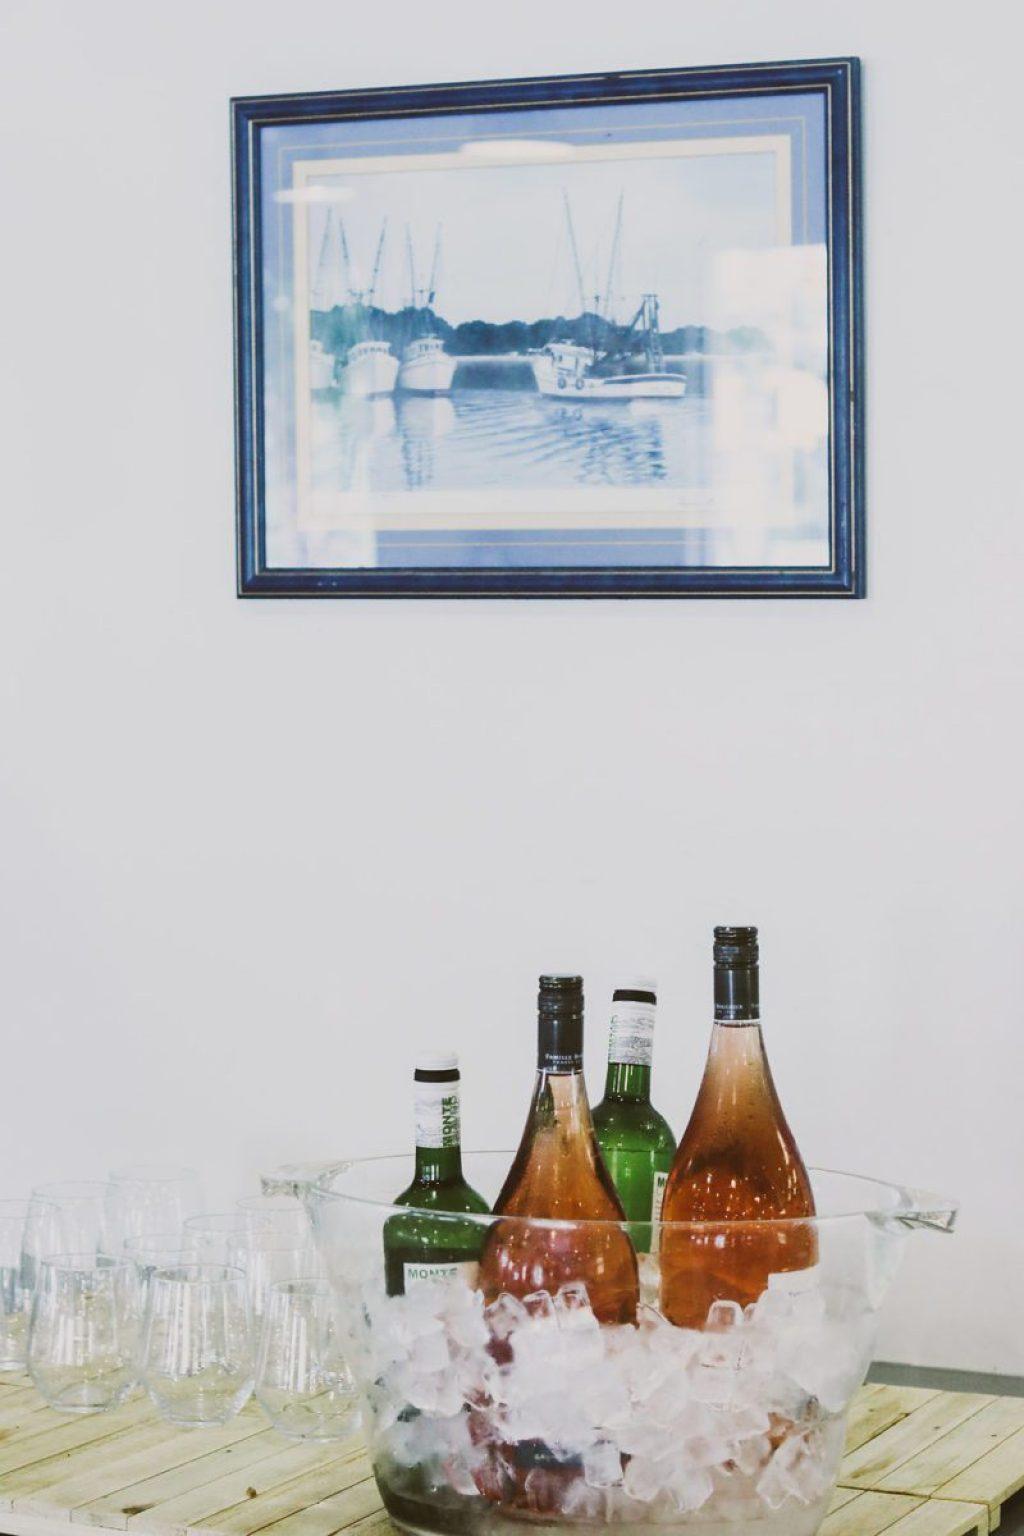 TTE-PaellaParadise-7067 North Carolina Seafood: Paella Paradise with The Table Experience